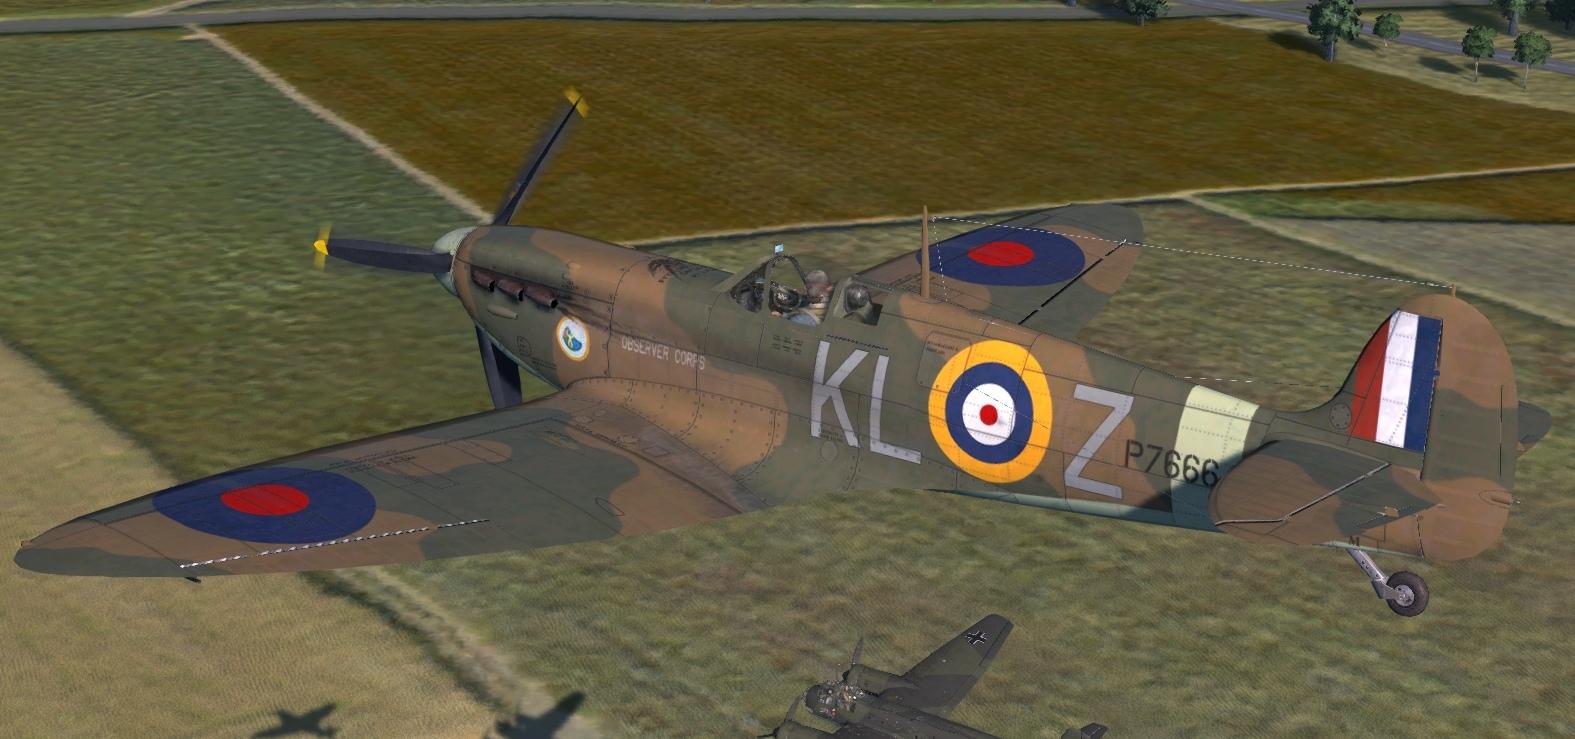 COD KF MkIIa RAF 54Sqn KLZ Don Finlay P7666 Hornchurch 1940 V0C